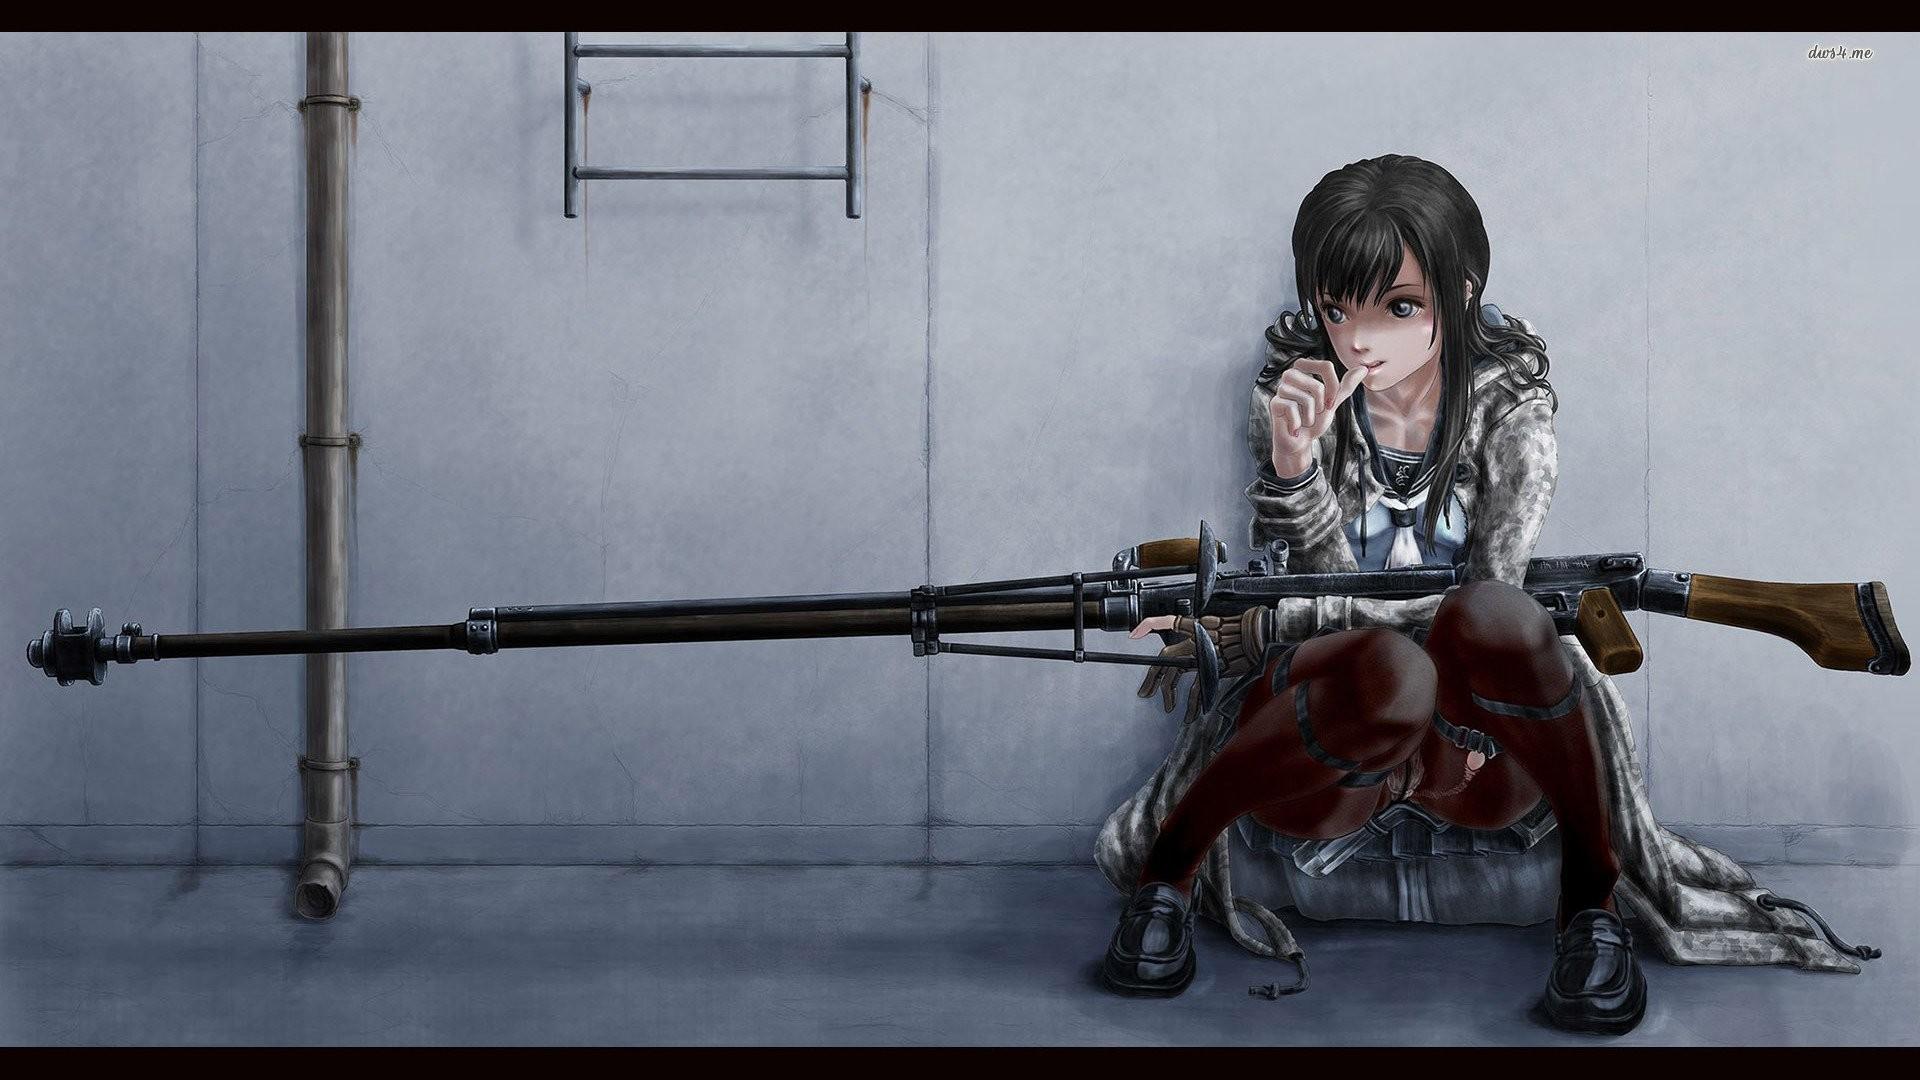 weapon dsr-50 sniper rifle HD wallpaper